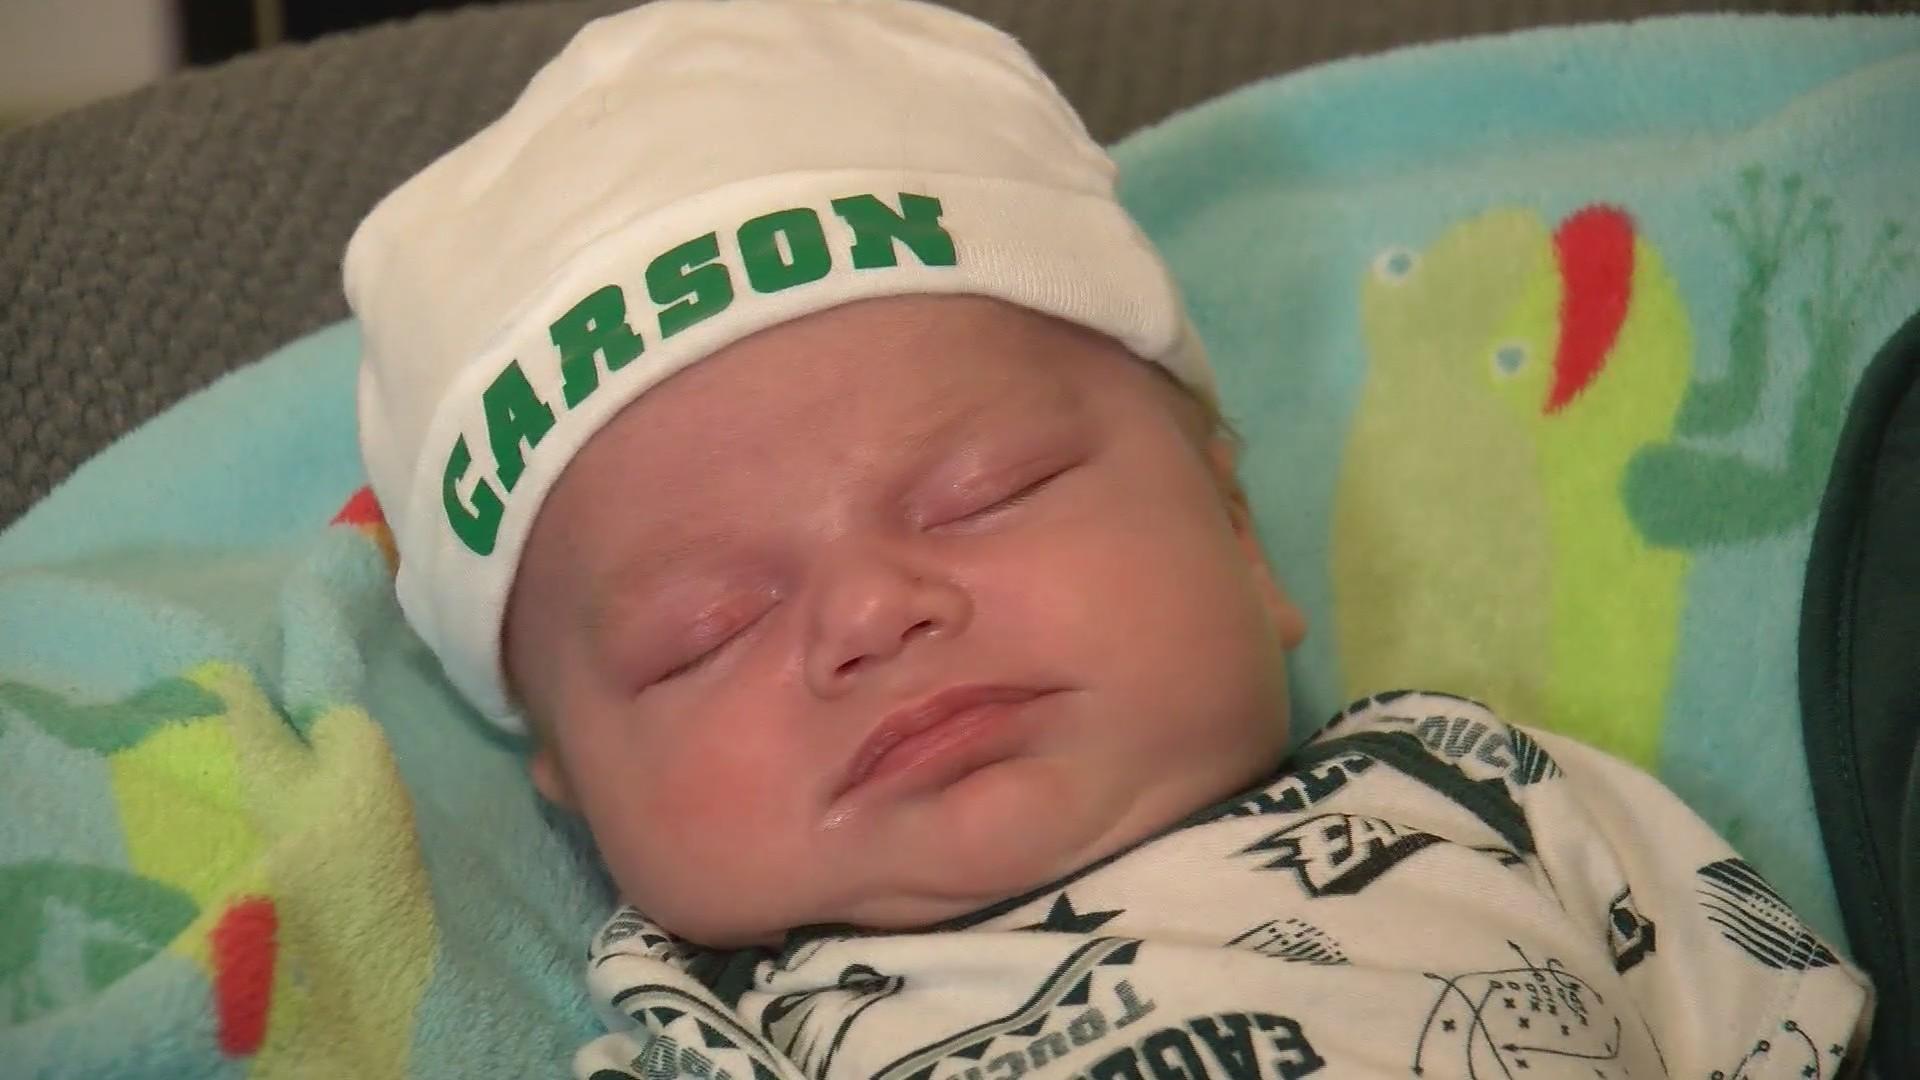 Eagles_Super_Bowl_baby_named_Carson_0_20181114043139